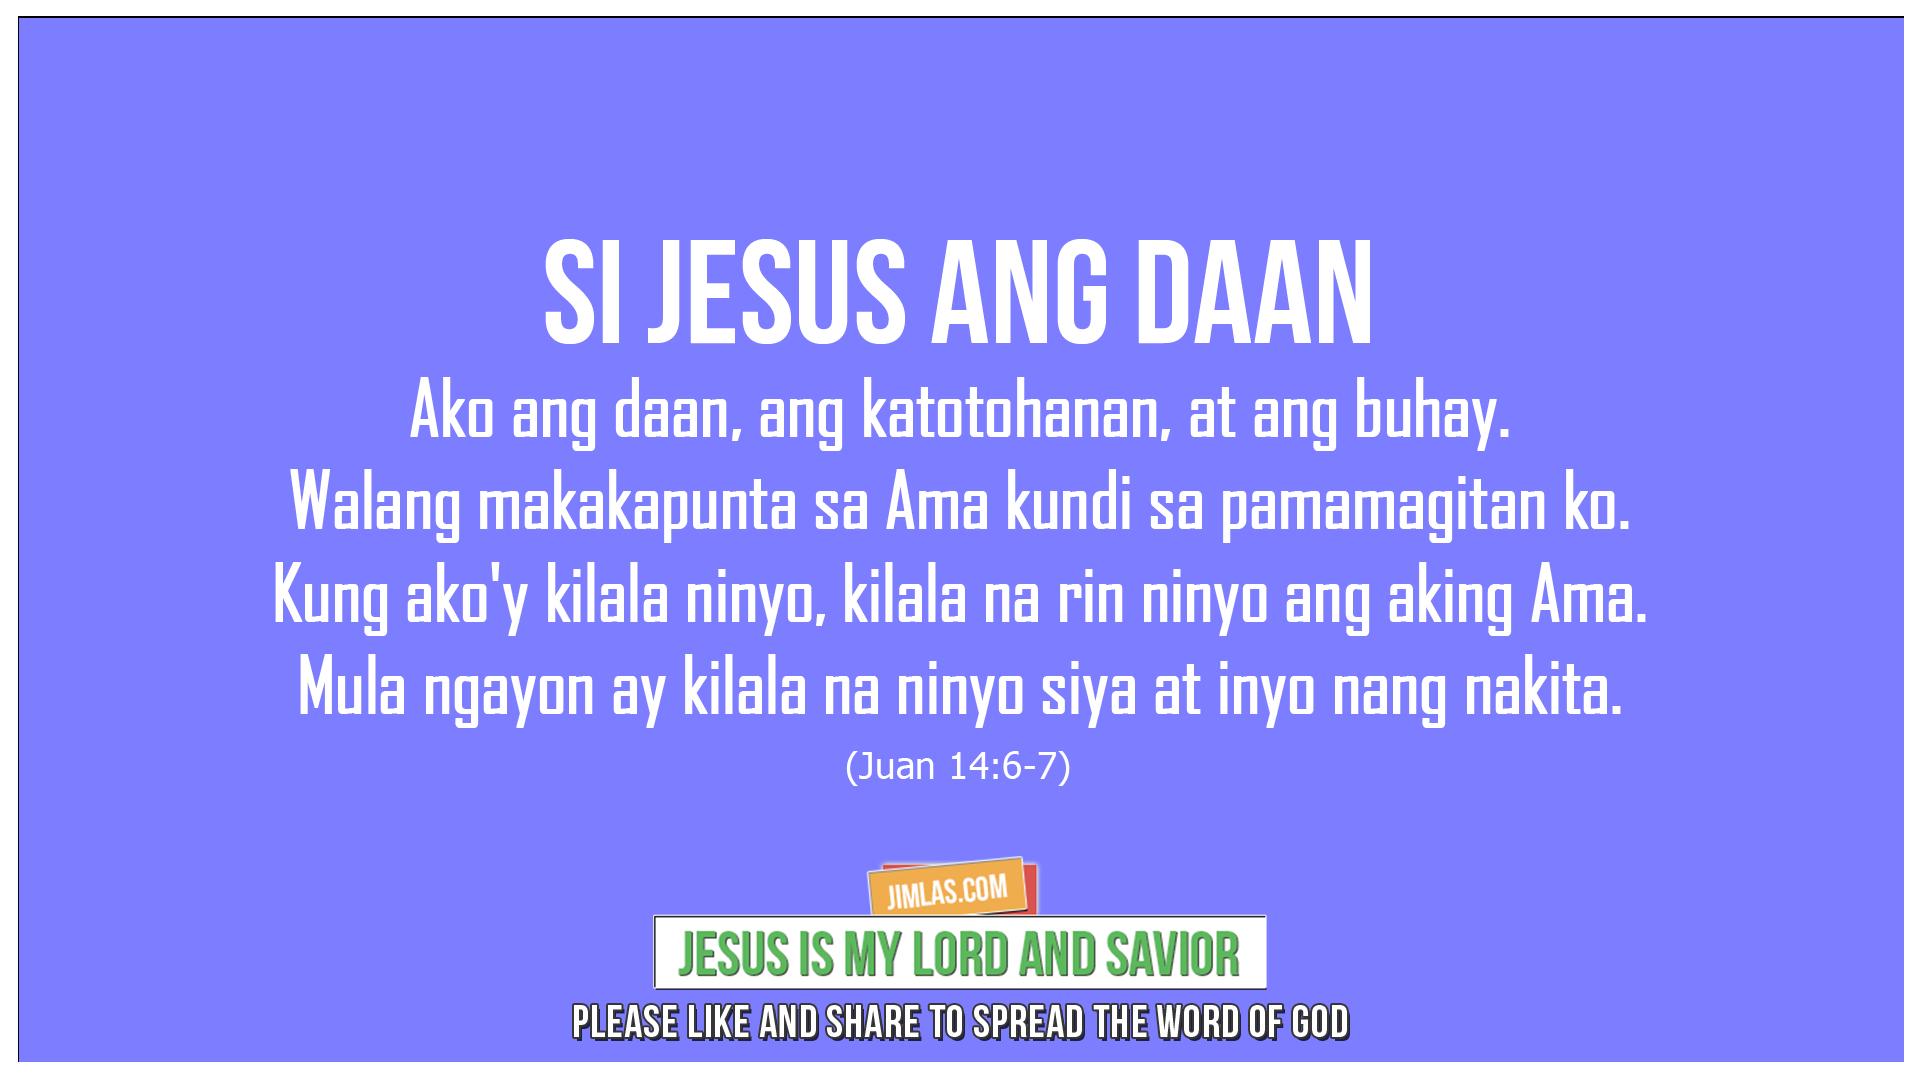 Juan 14 6-7, Juan 14:6-7